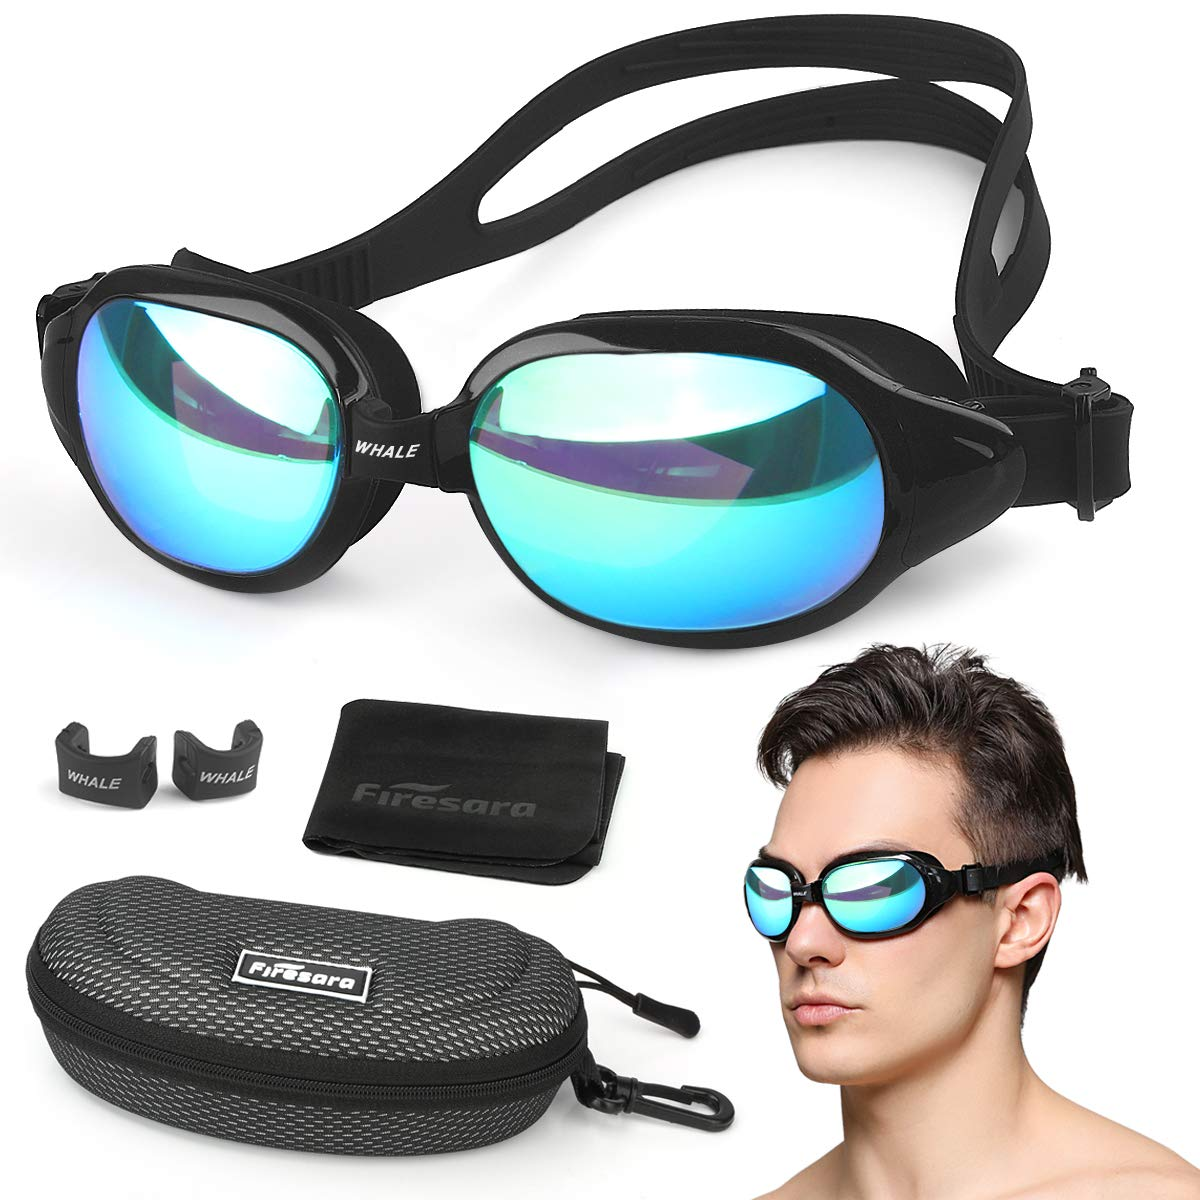 Firesara Swim Goggles